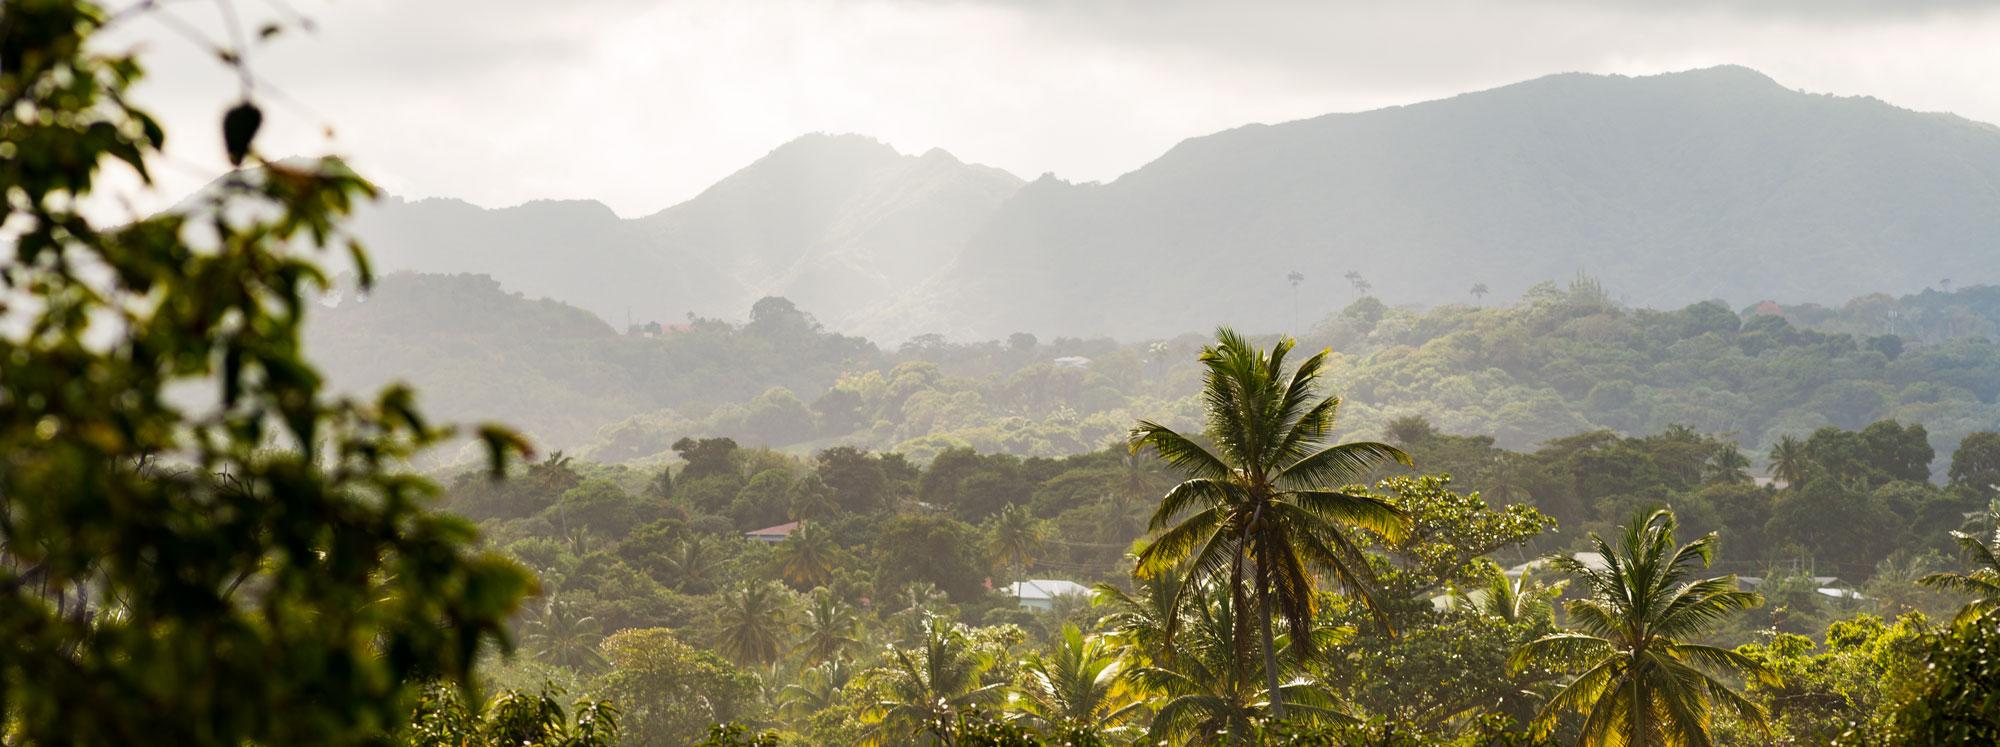 renegade rum, renegade rum distillery, renegade rum grenada, renegade rum distillery grenada, single cane rum, terroir driven rum, renegade rum cane fields, soils of grenada, caneco, sugar cane grenada, caribbean, mark reynier, why grenada